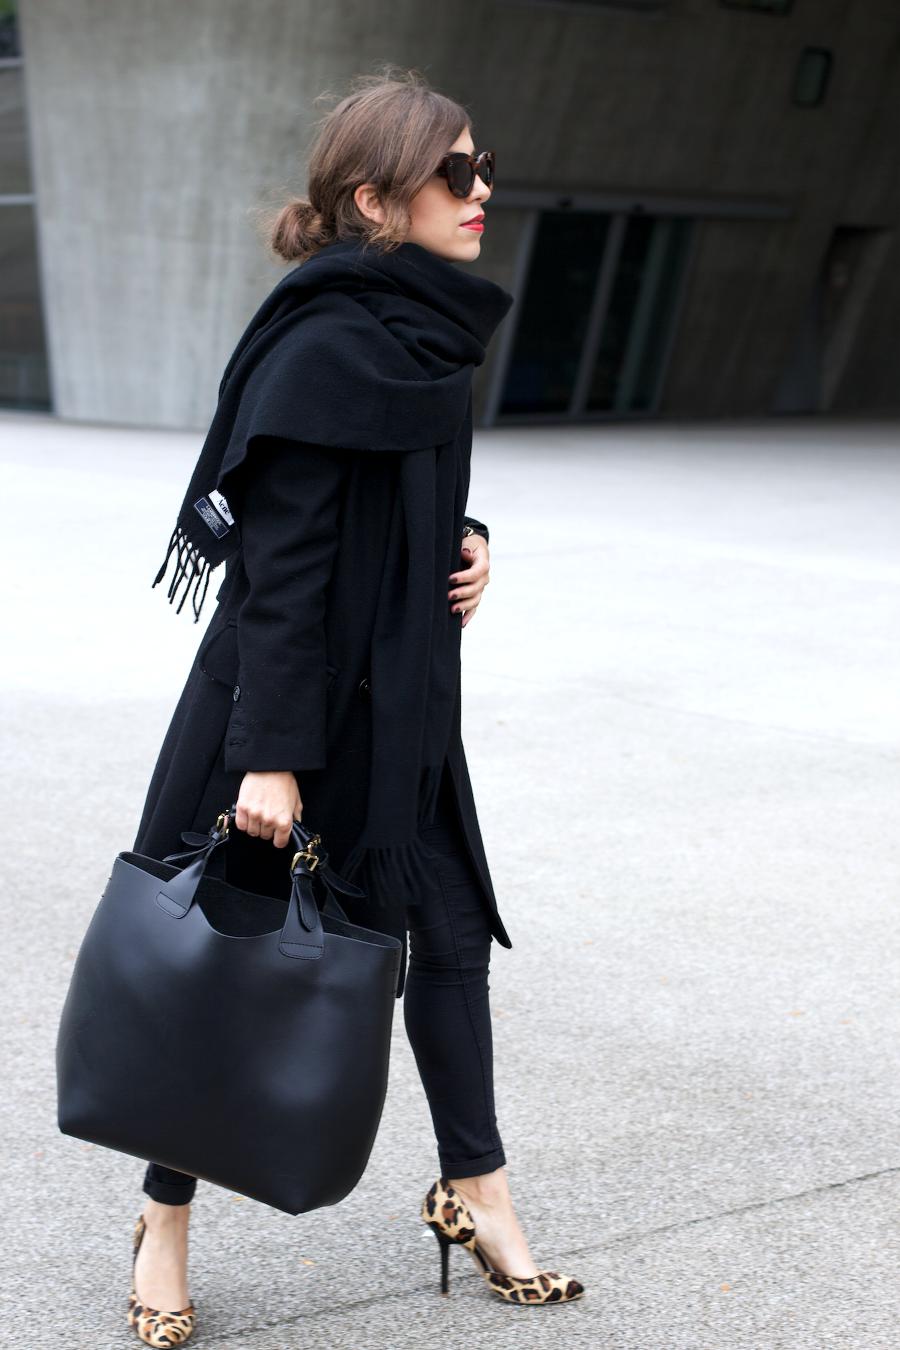 All Black Outfit Leopard Pumps